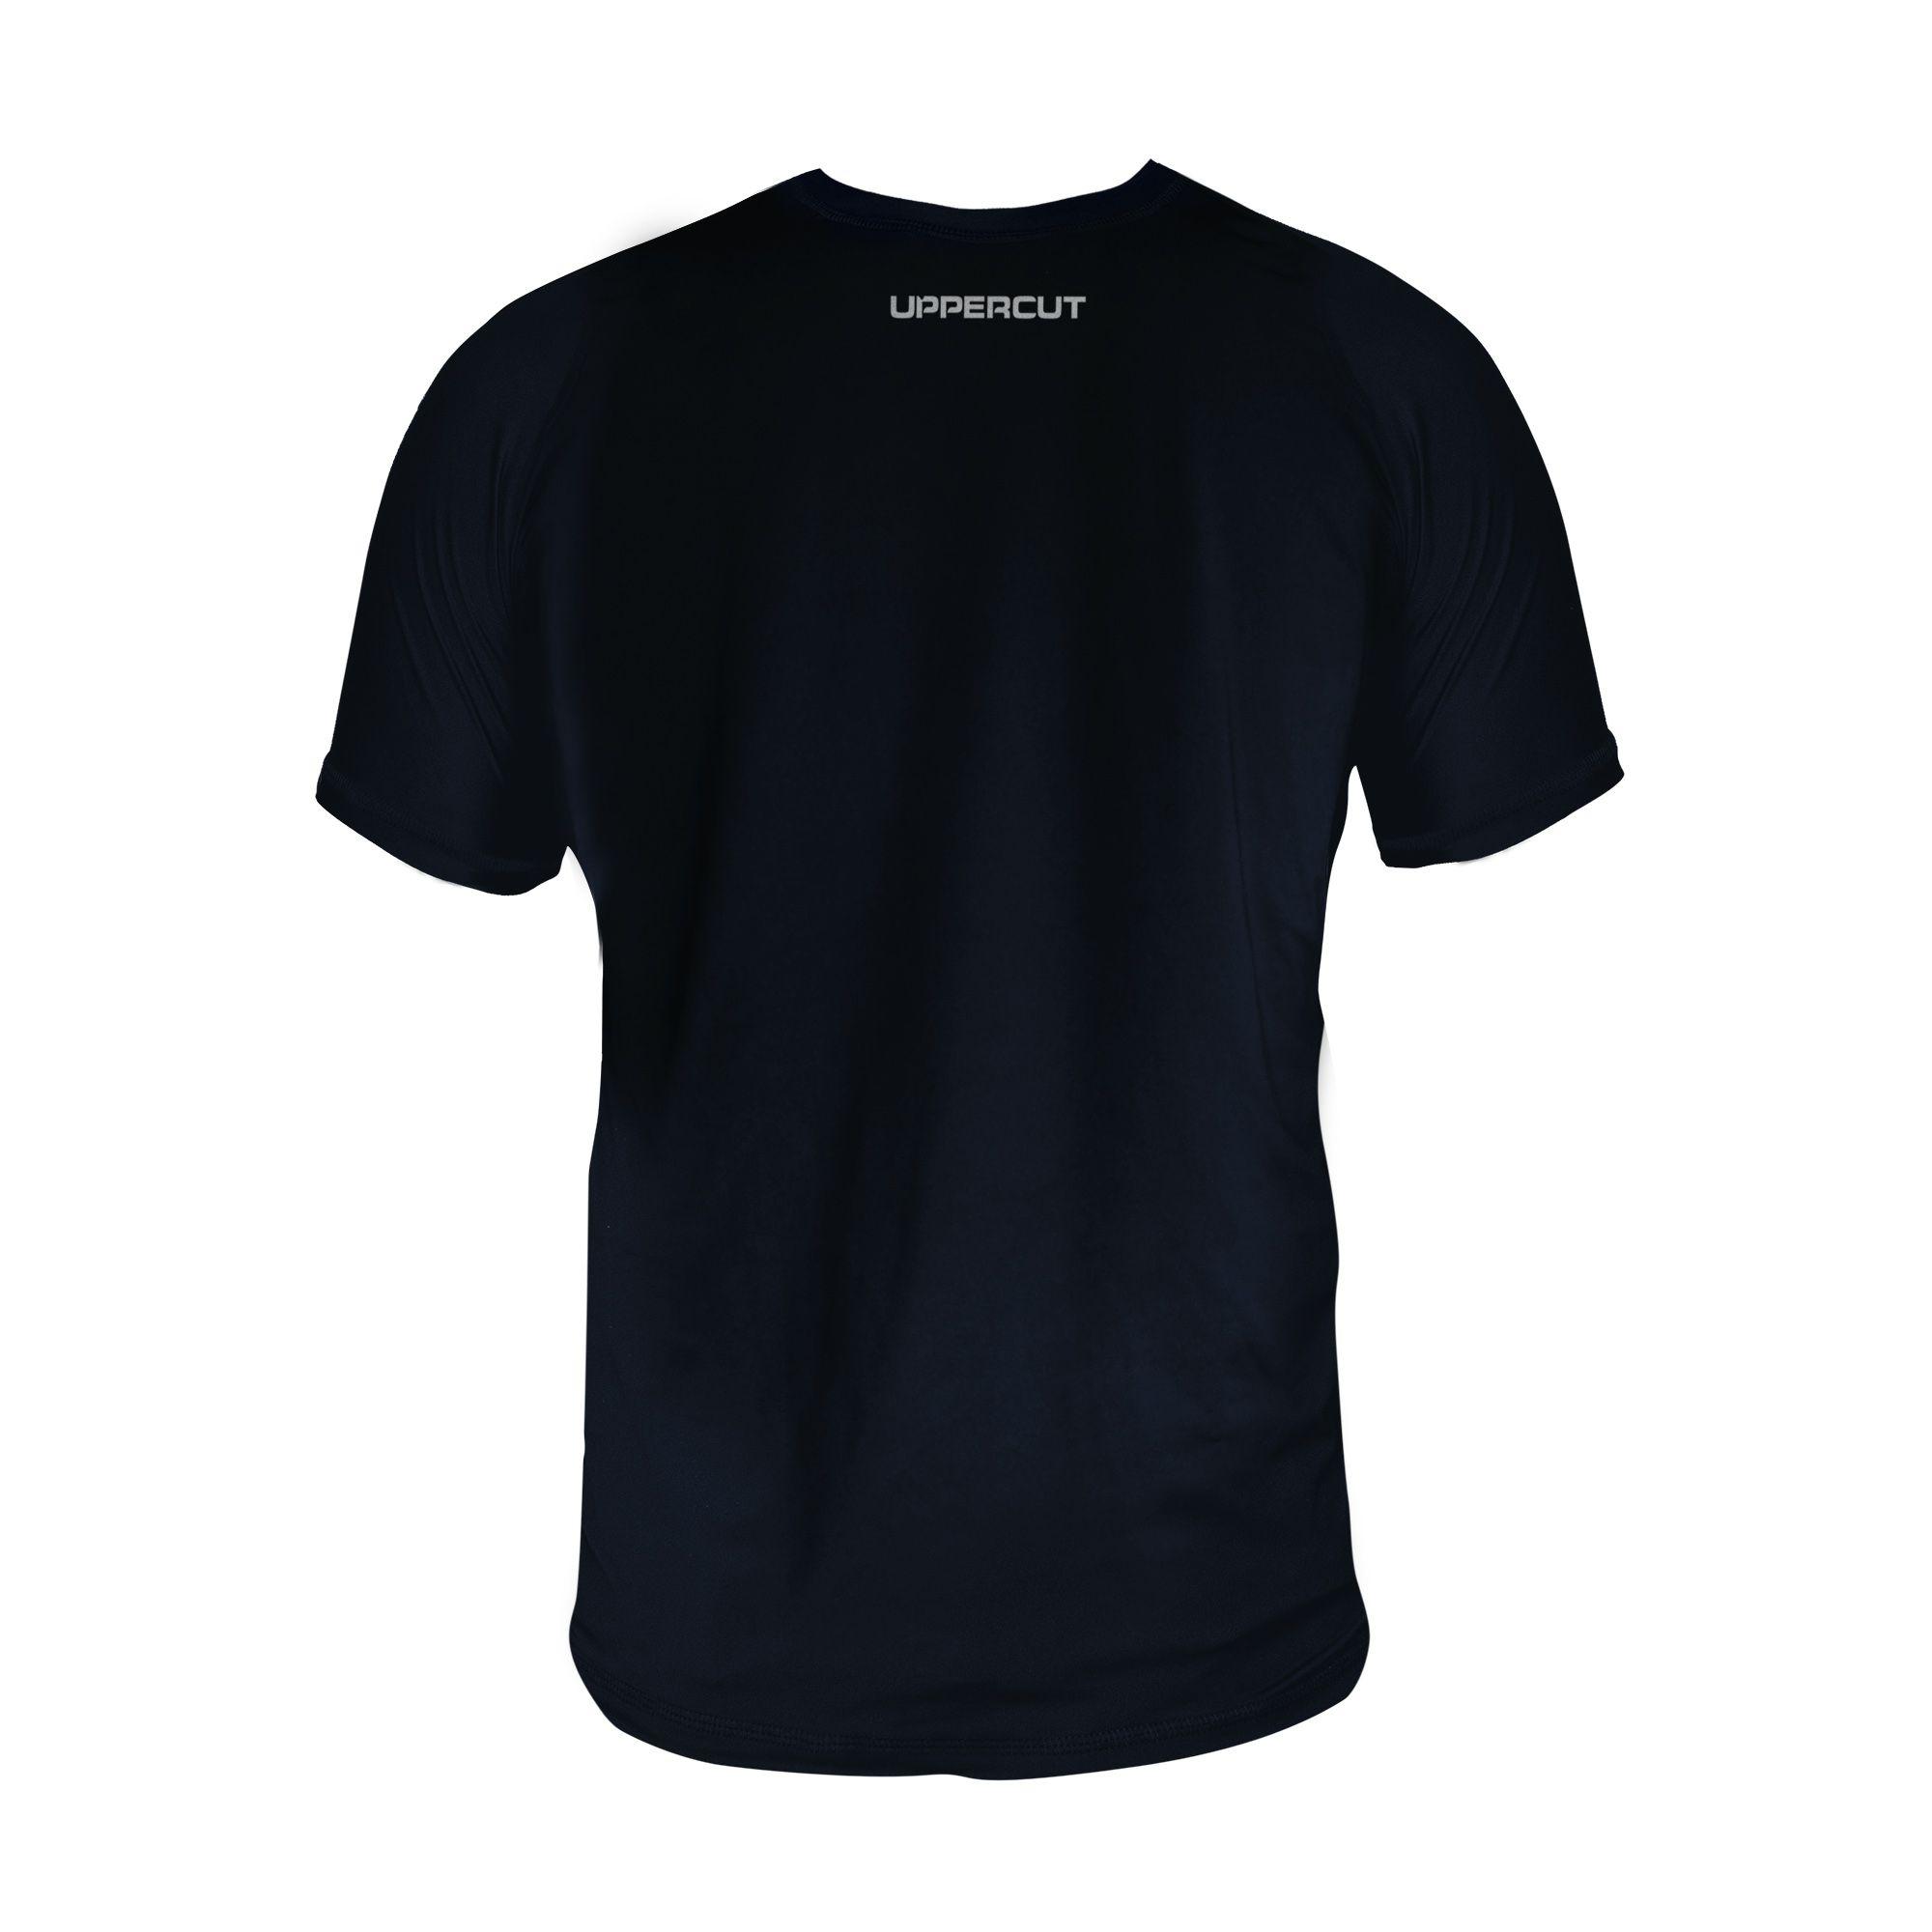 Camiseta Jiu Jitsu Catagatame - Treino Dry Fit UV-50+ - Preta